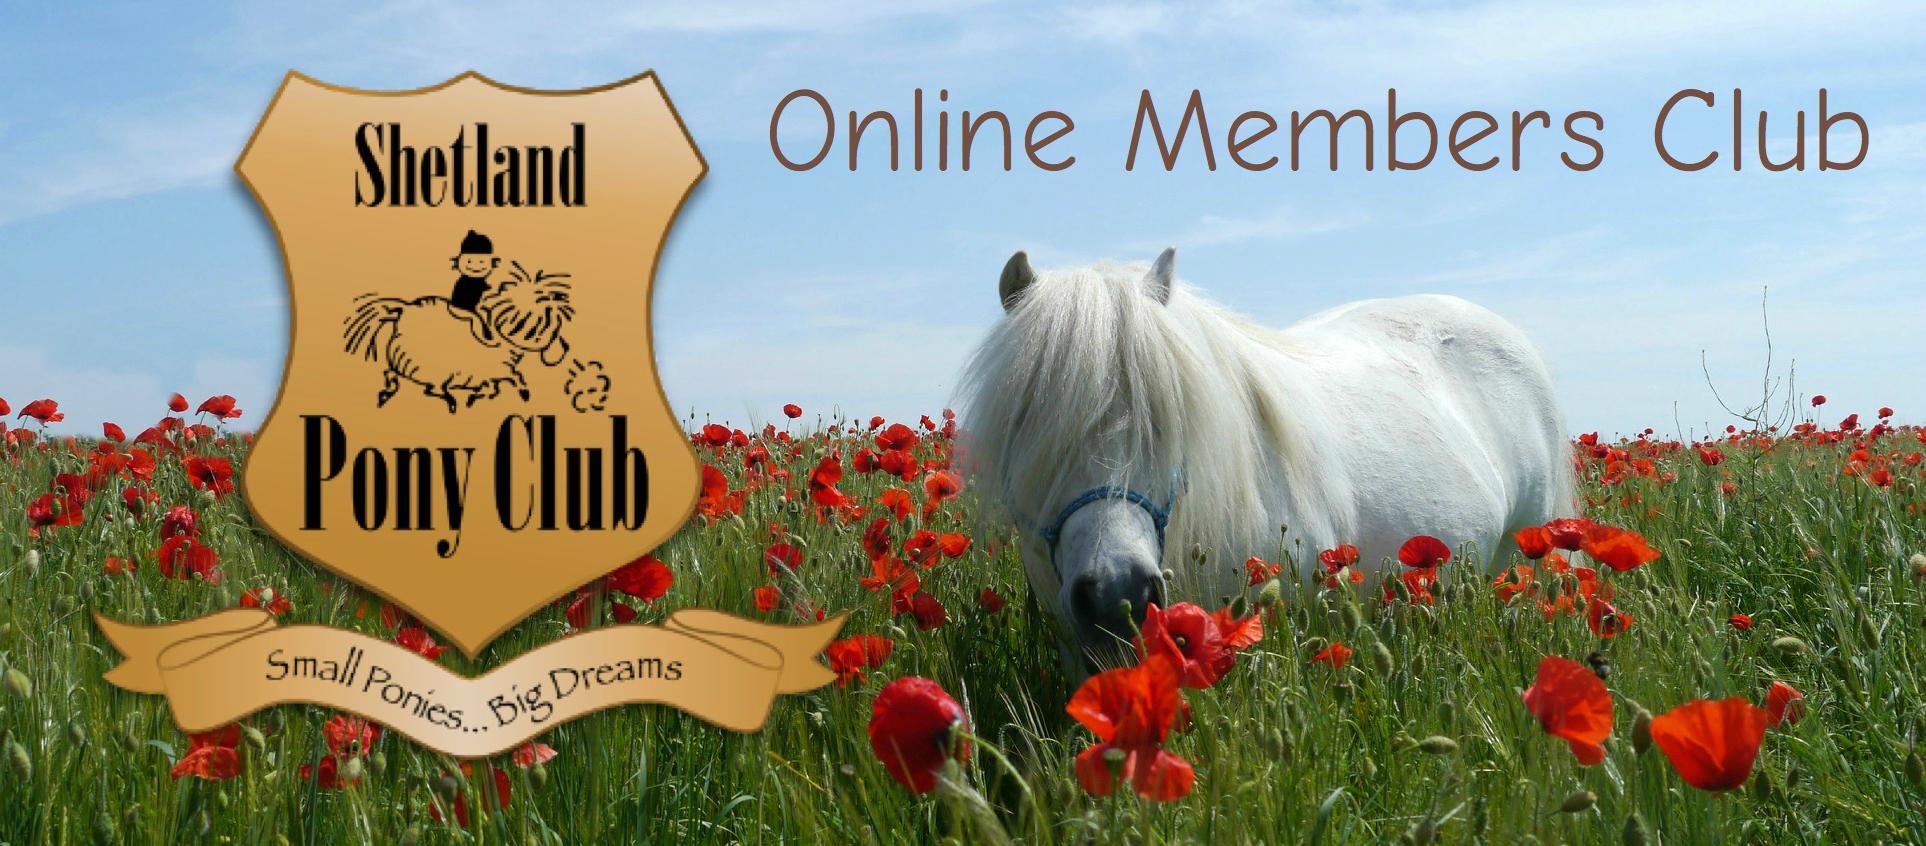 Shetland Pony Club Online